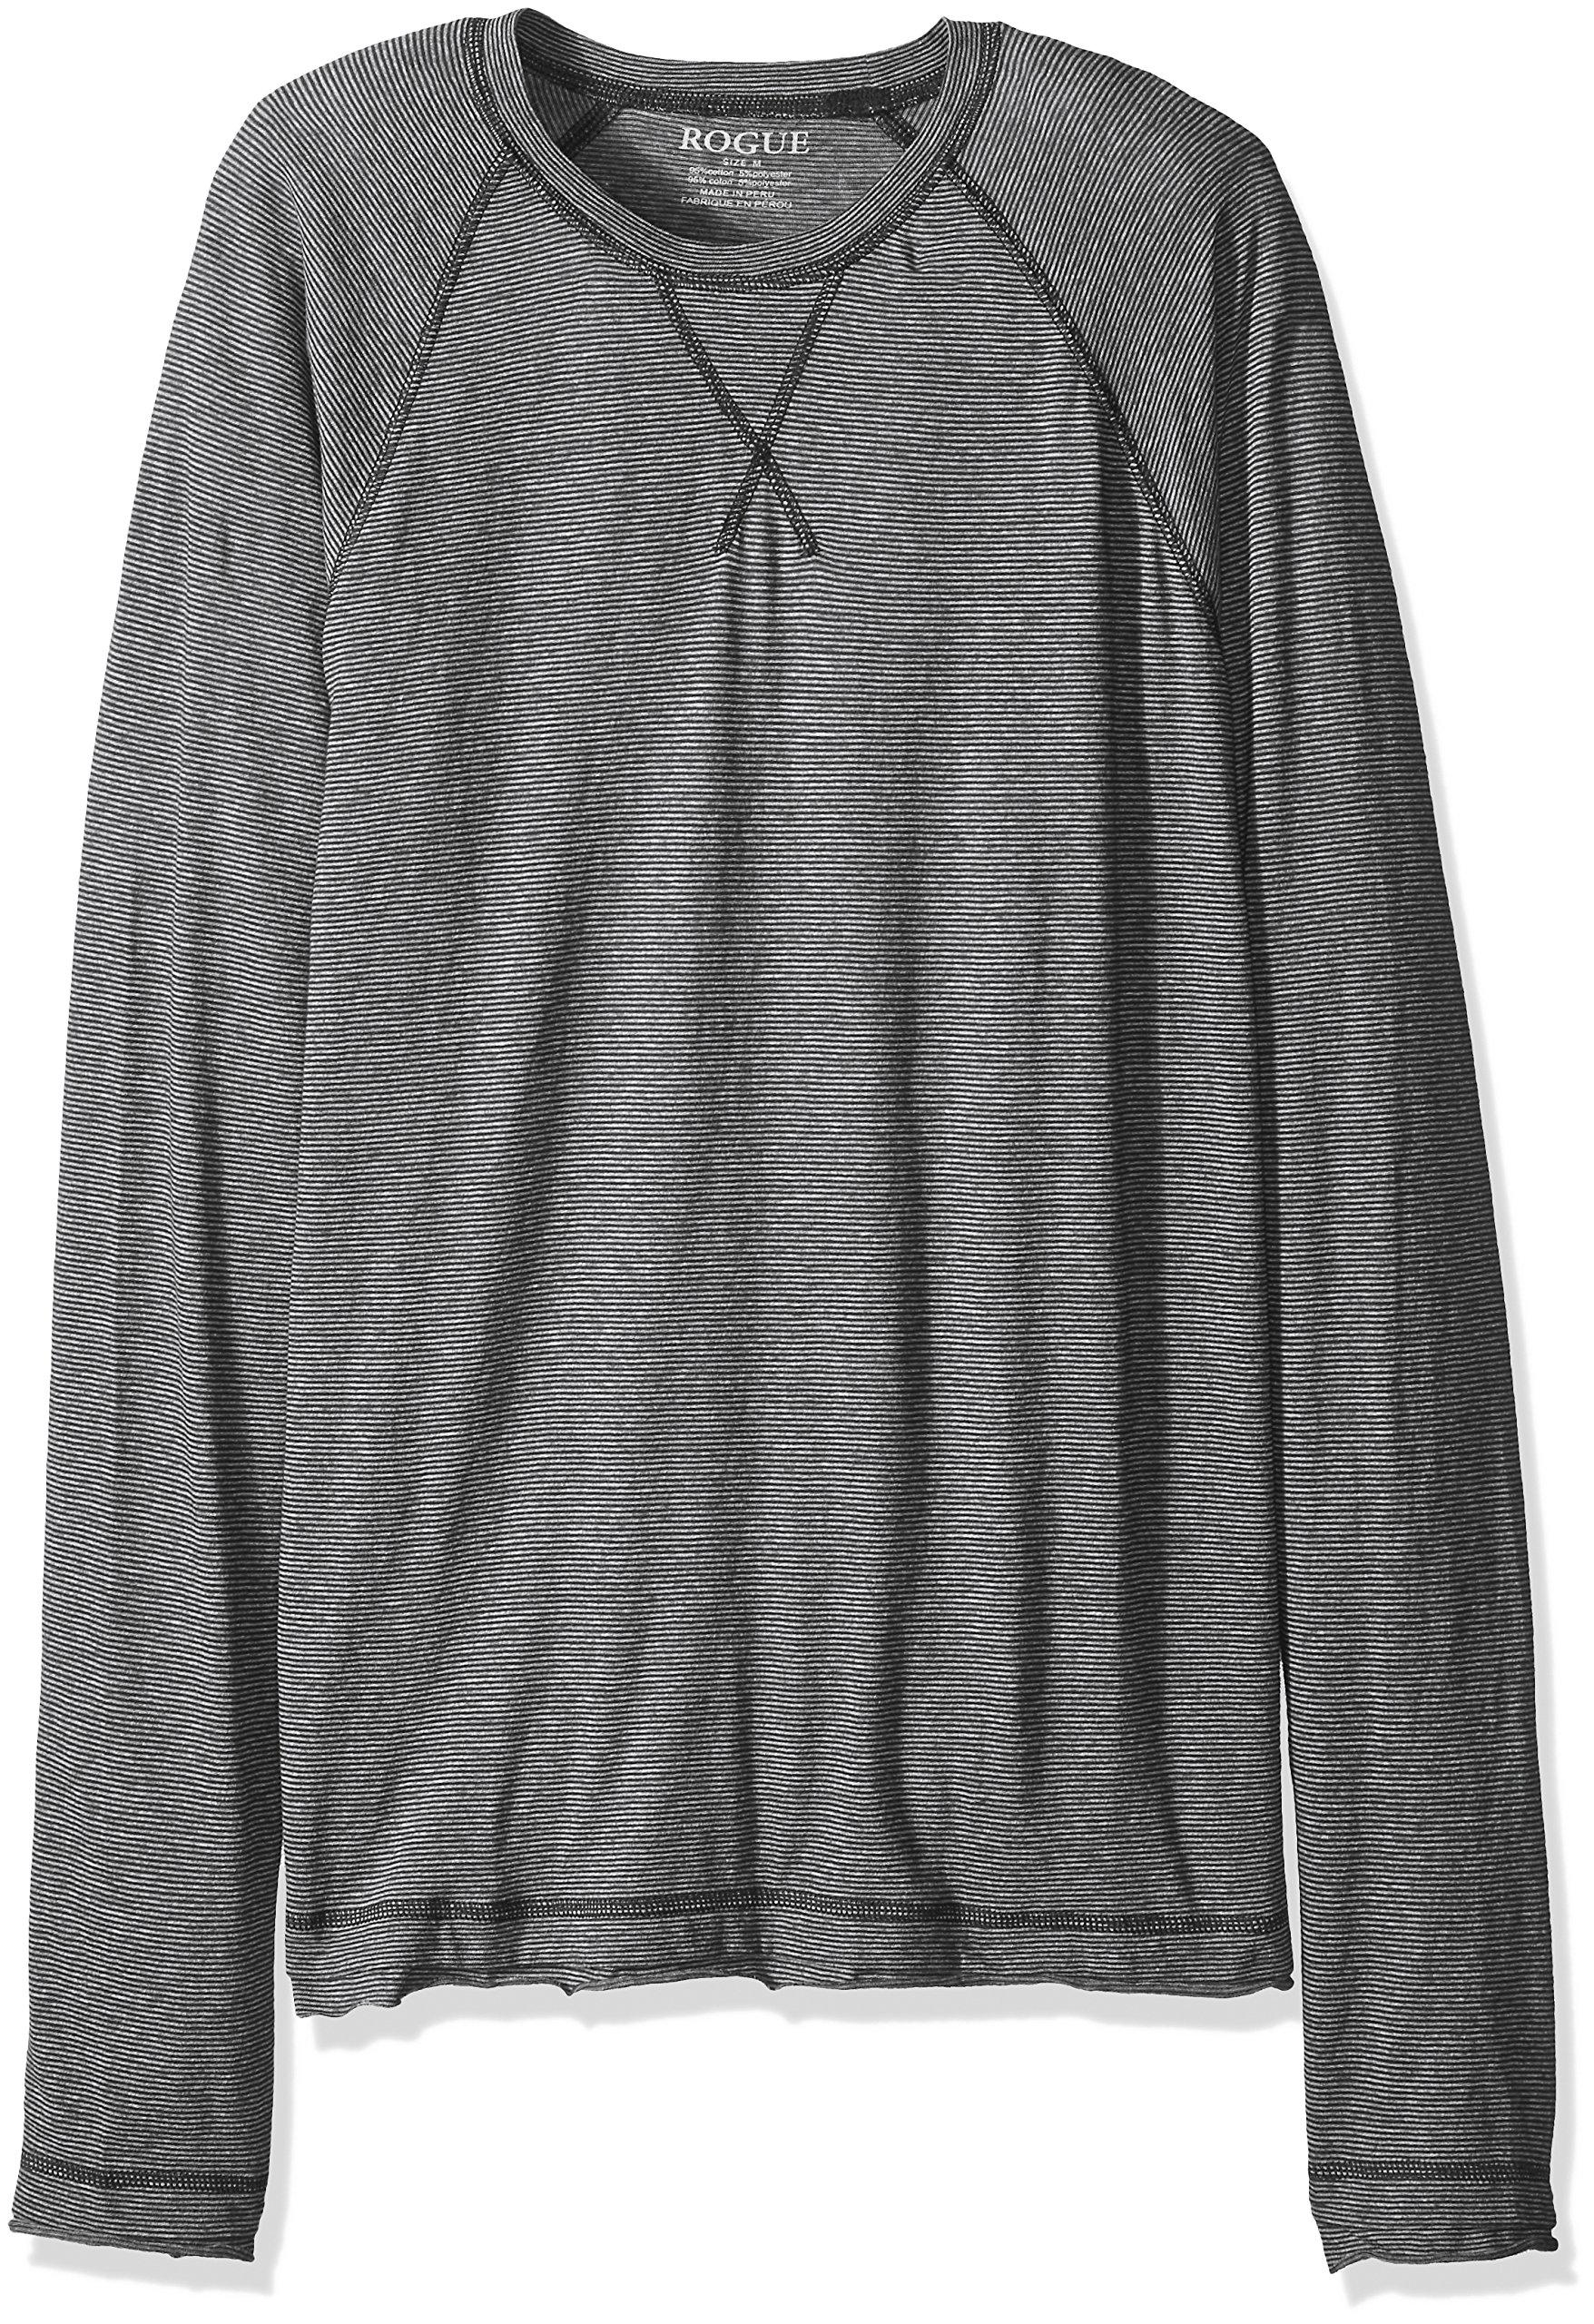 ROGUE Men's Long Sleeve Striped T-Shirt, Navy/Charcoal, Medium by Rogue (Image #1)